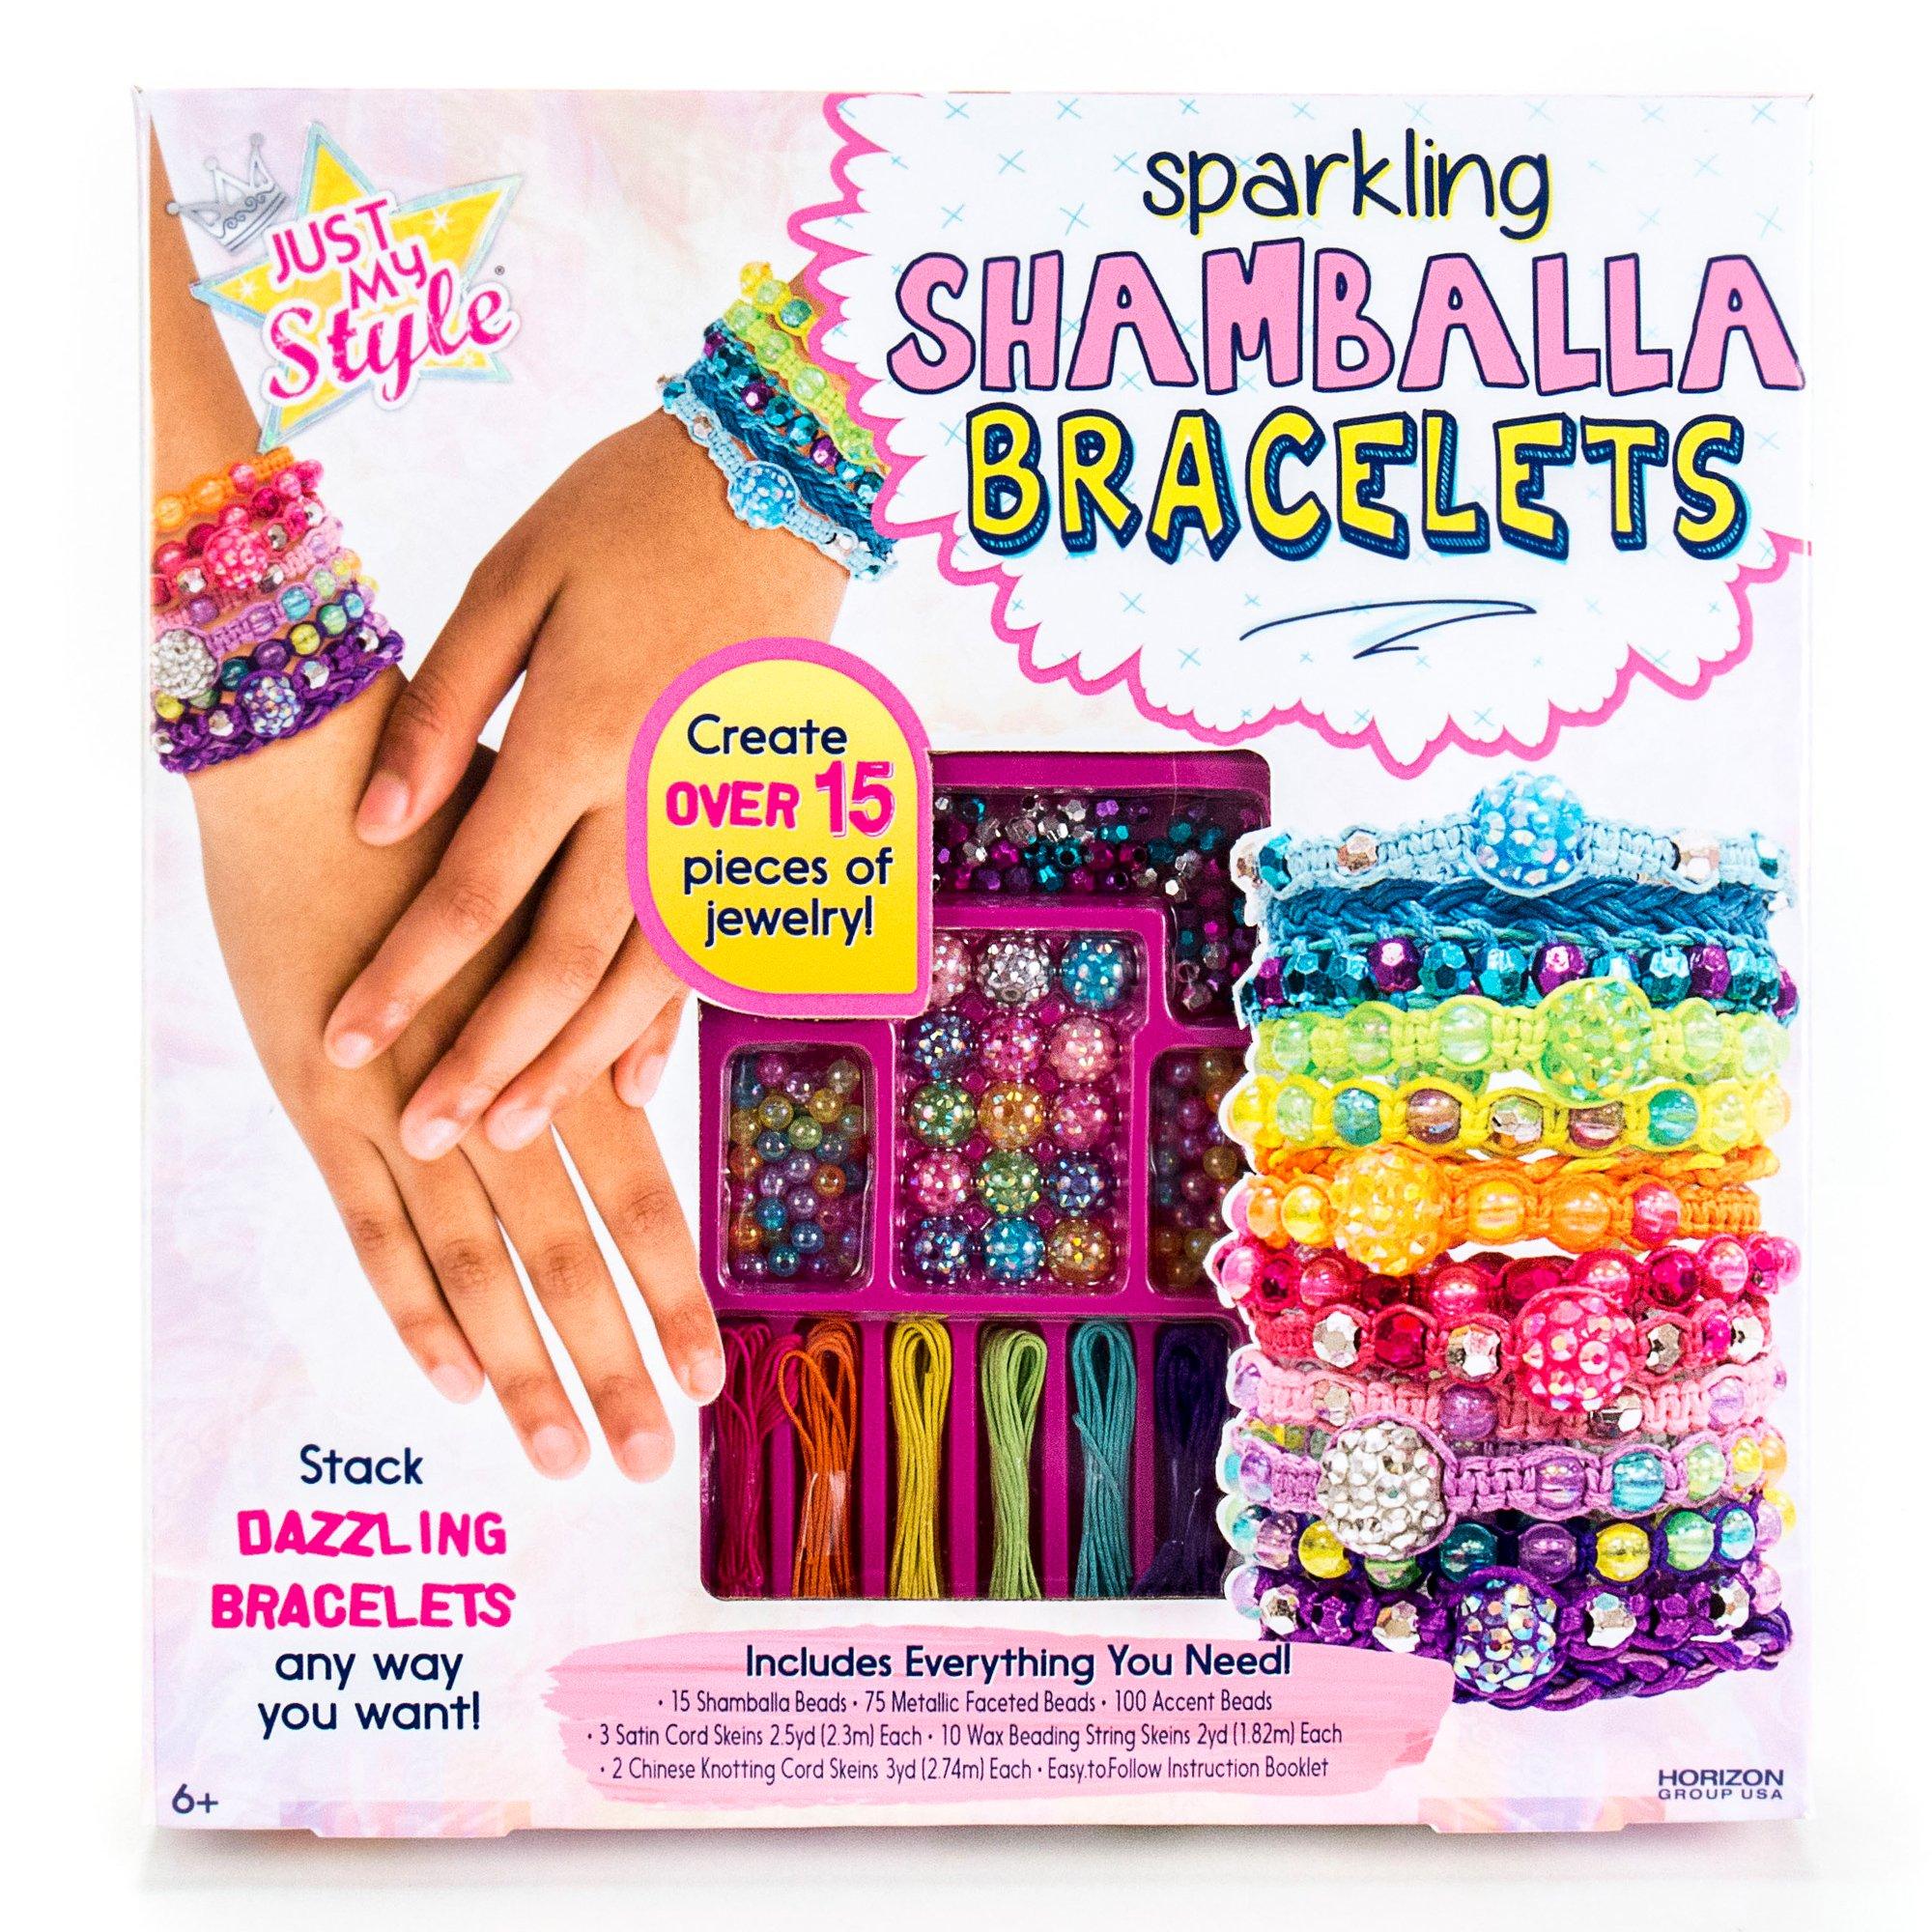 Just My Style Shamballa Bracelets